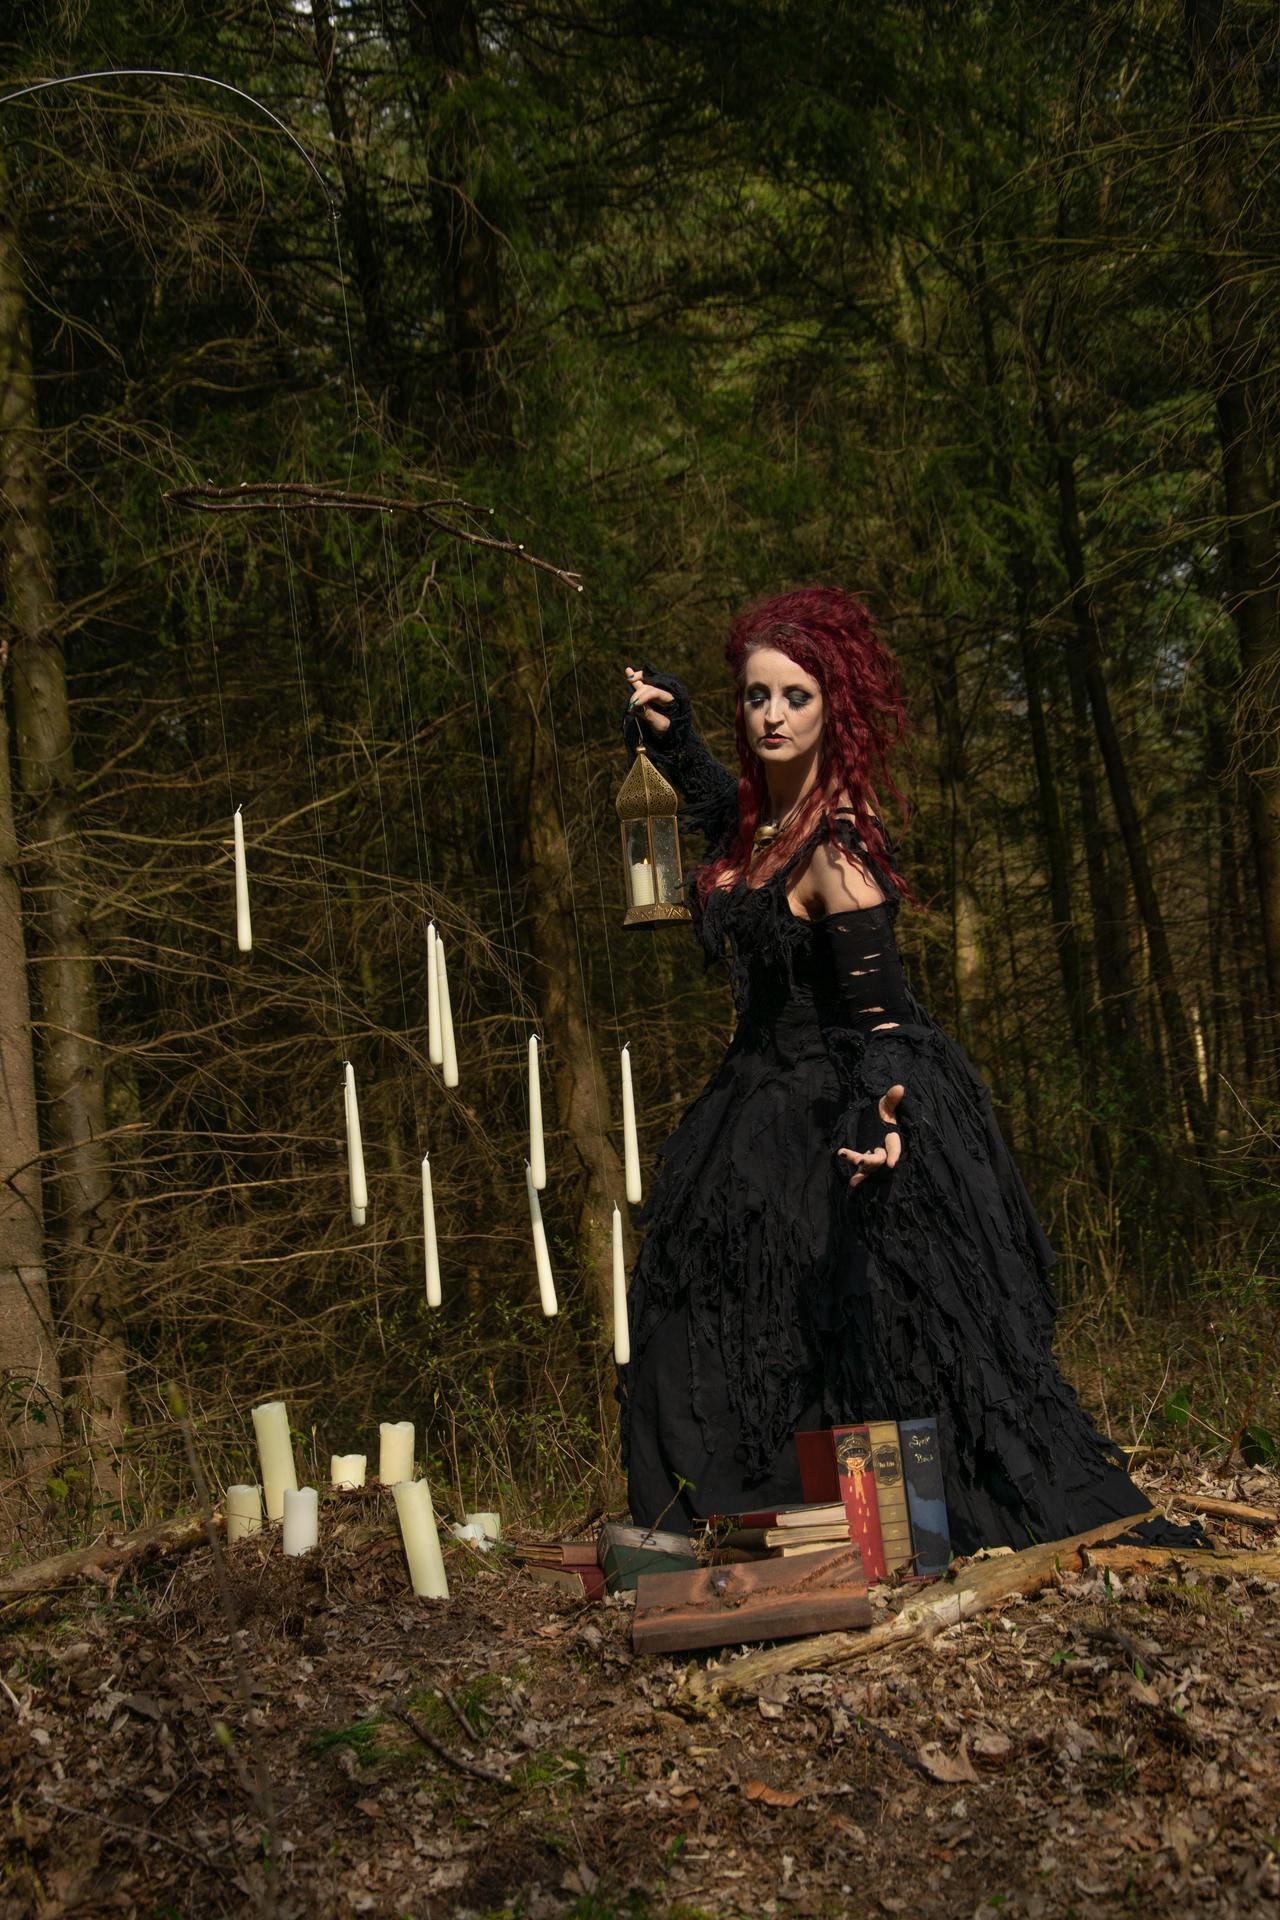 Stock - Bellatrix Lestrange holding lantern stand